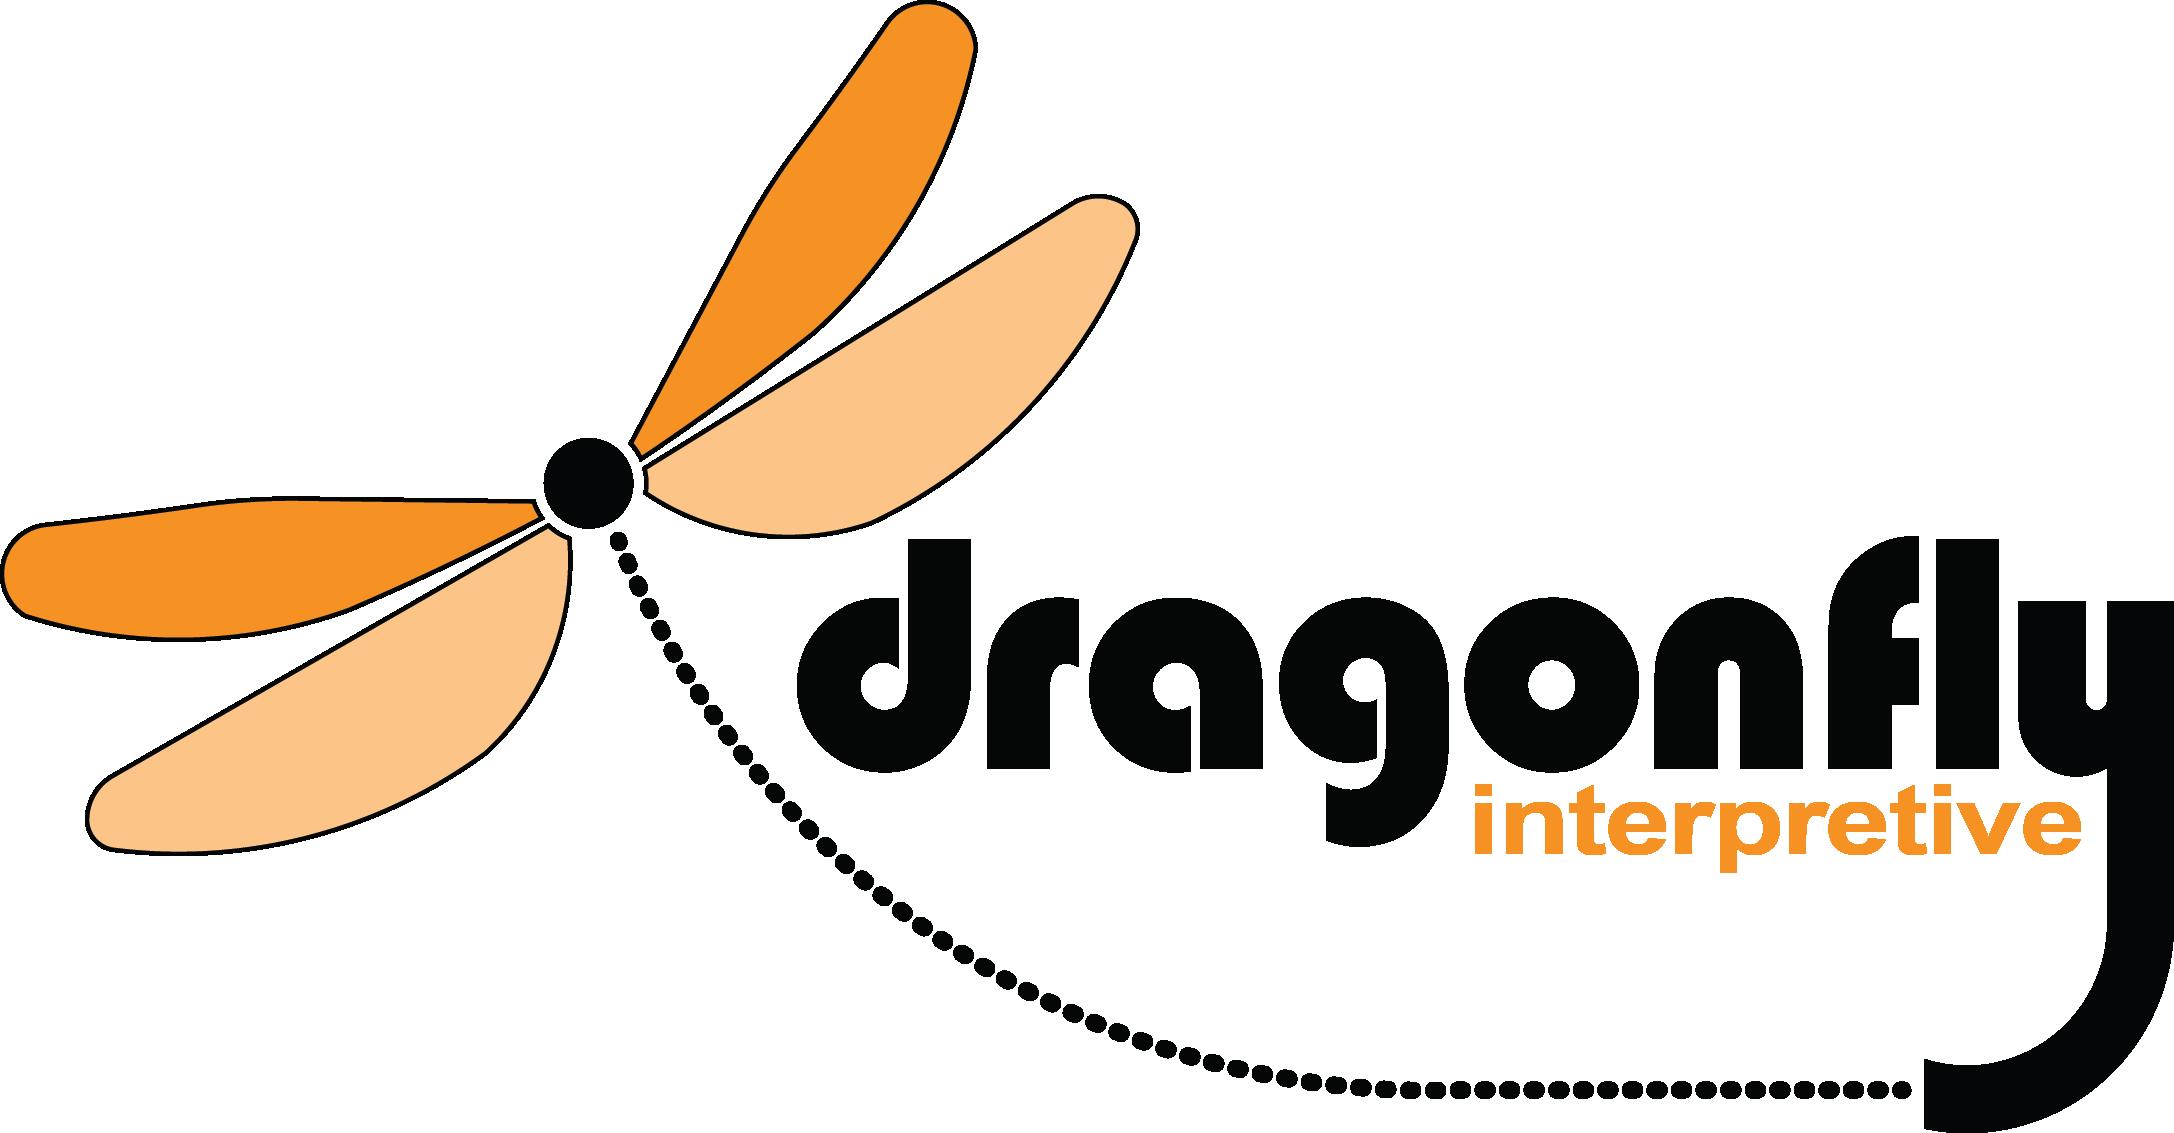 dragonfly interpretive: logo